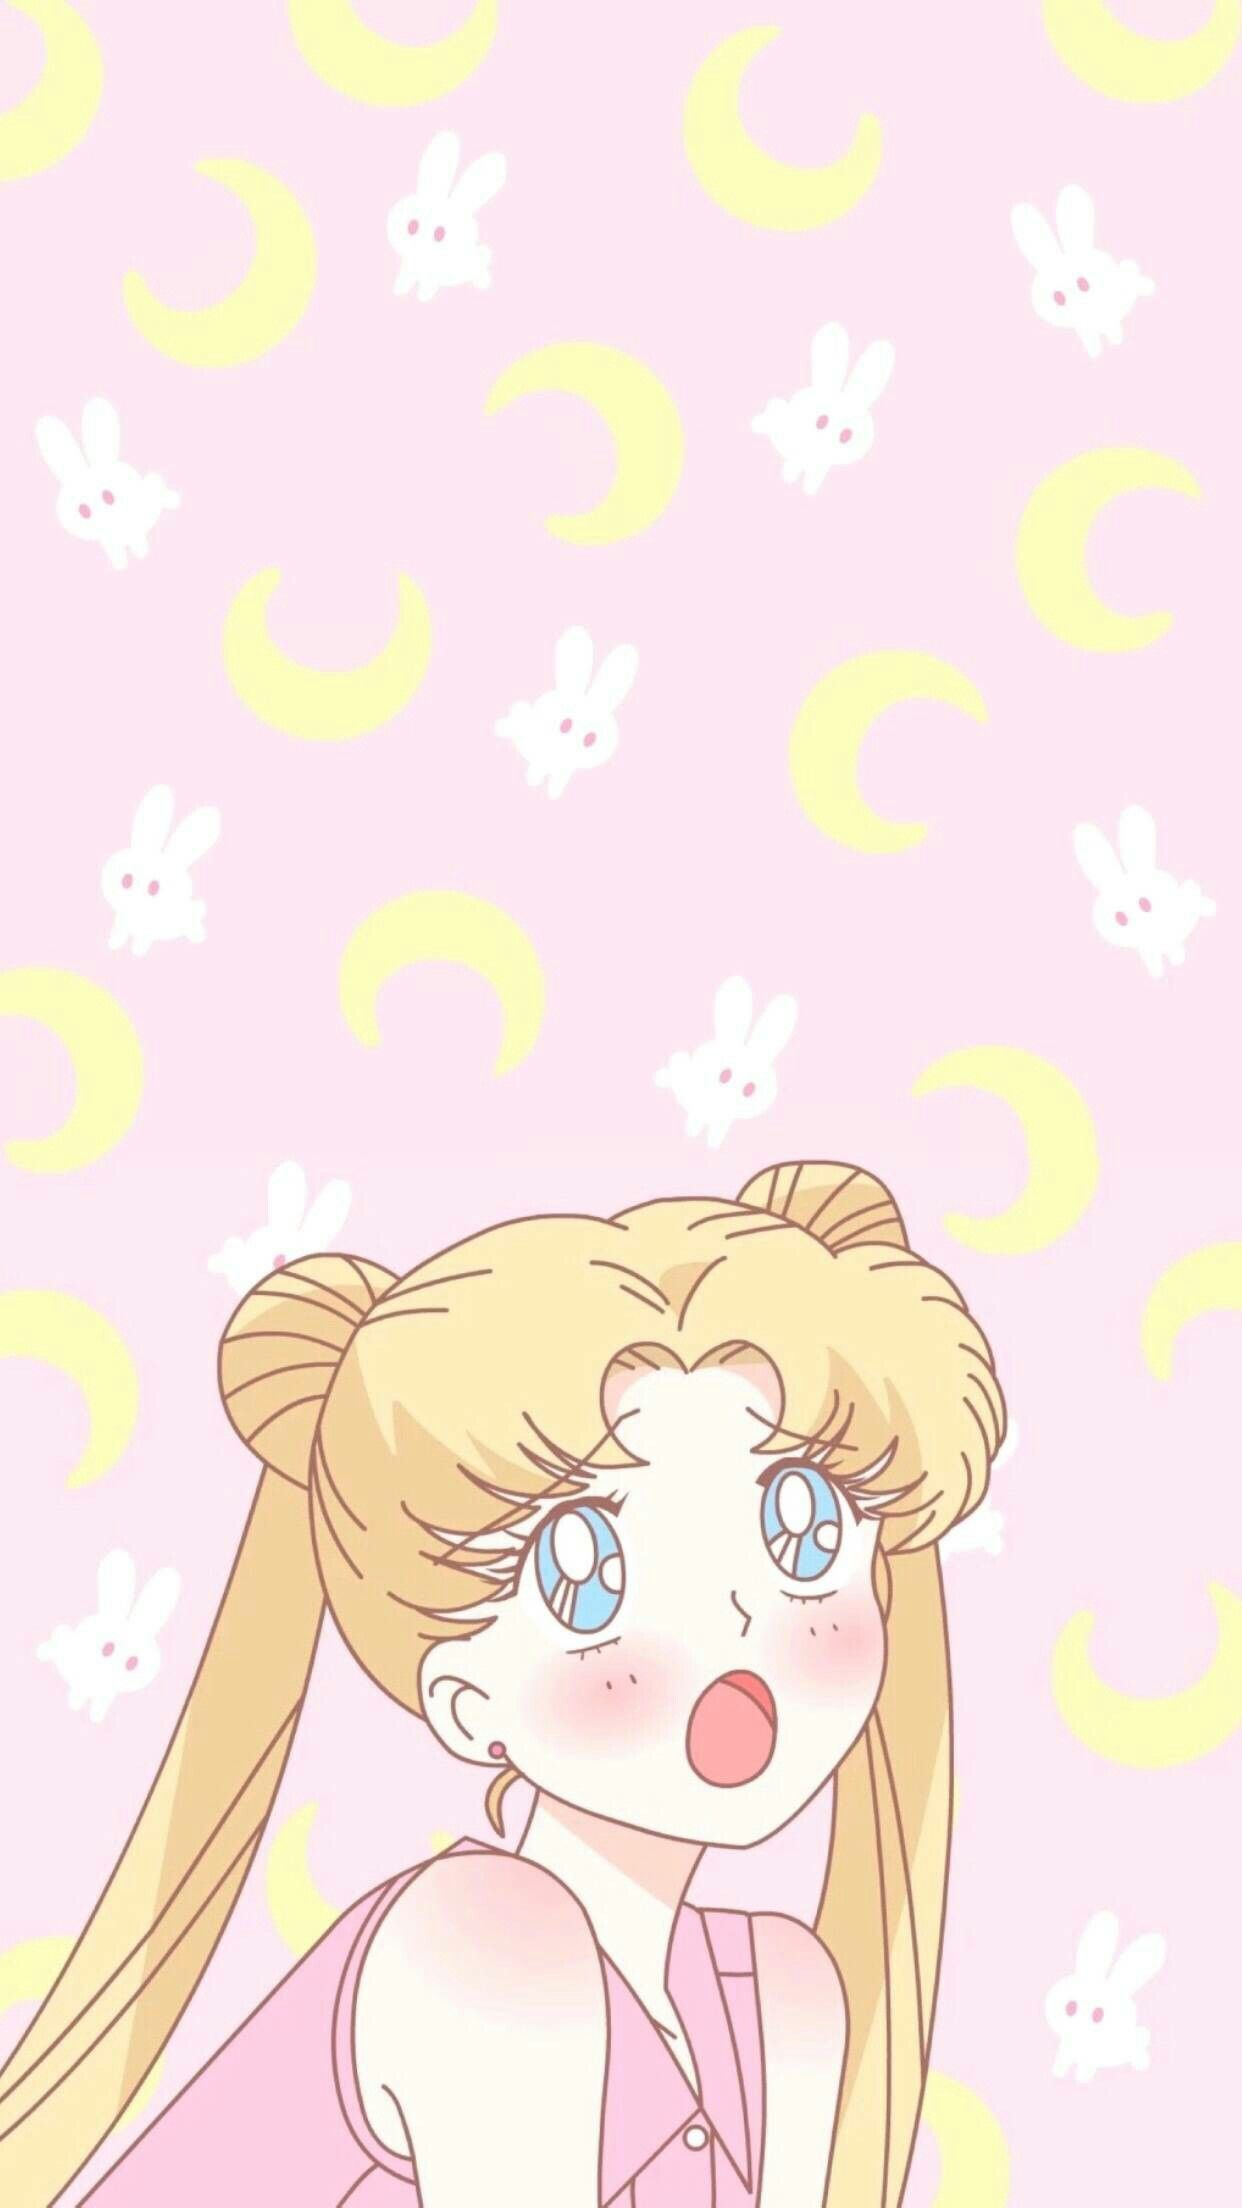 Kawaii Anime Sailor Moon Wallpapers   Wallpaper Cave